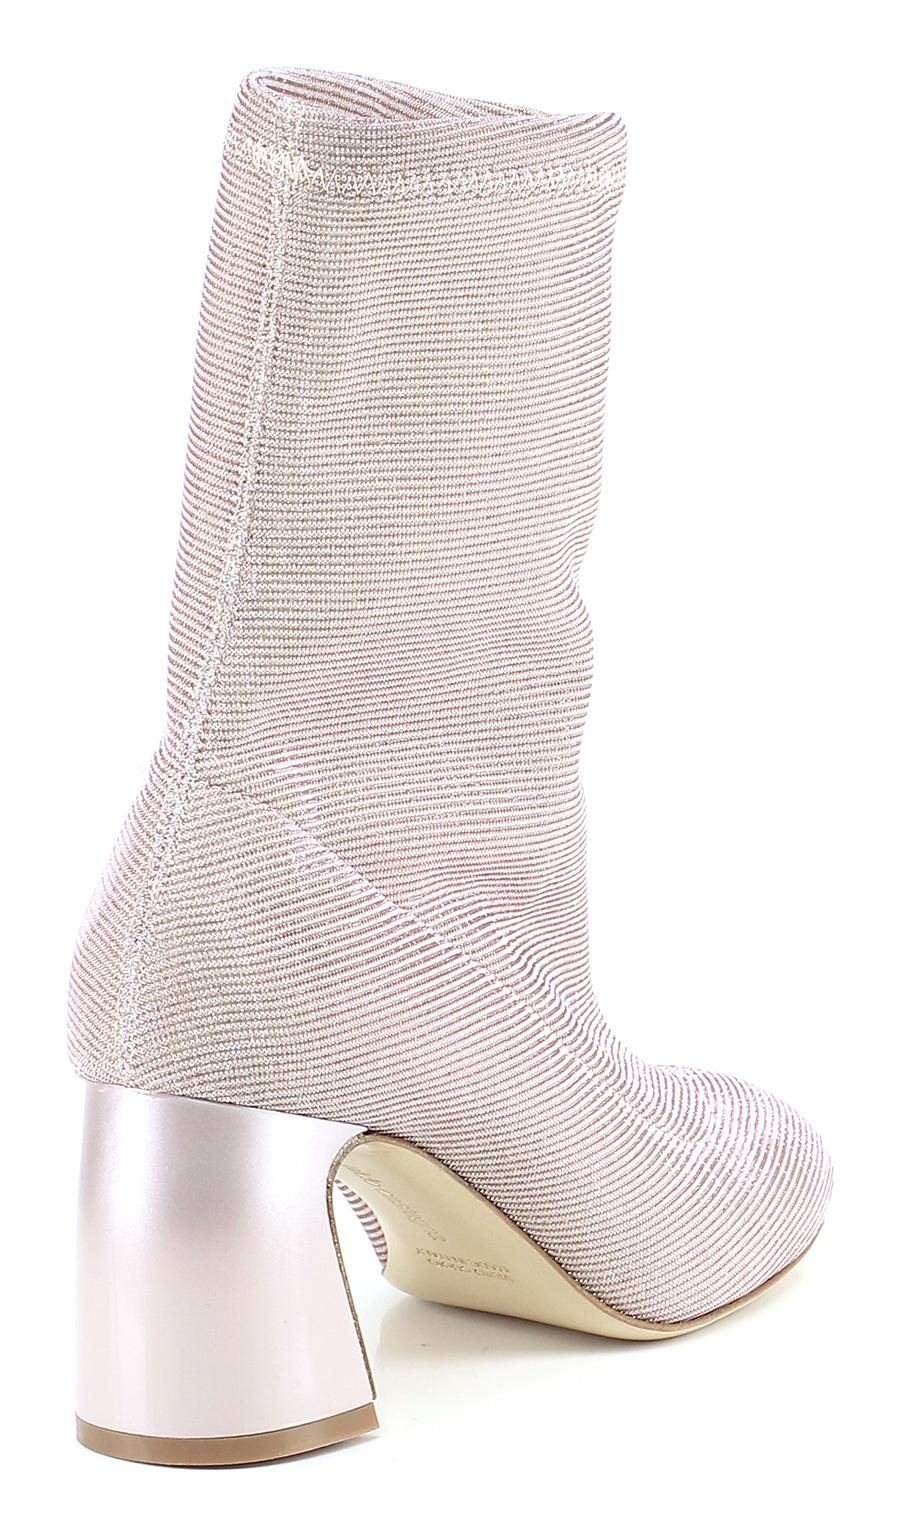 Tronchetto Rosa Aldo Castagna Mode billige billige Mode Schuhe 59a8c9